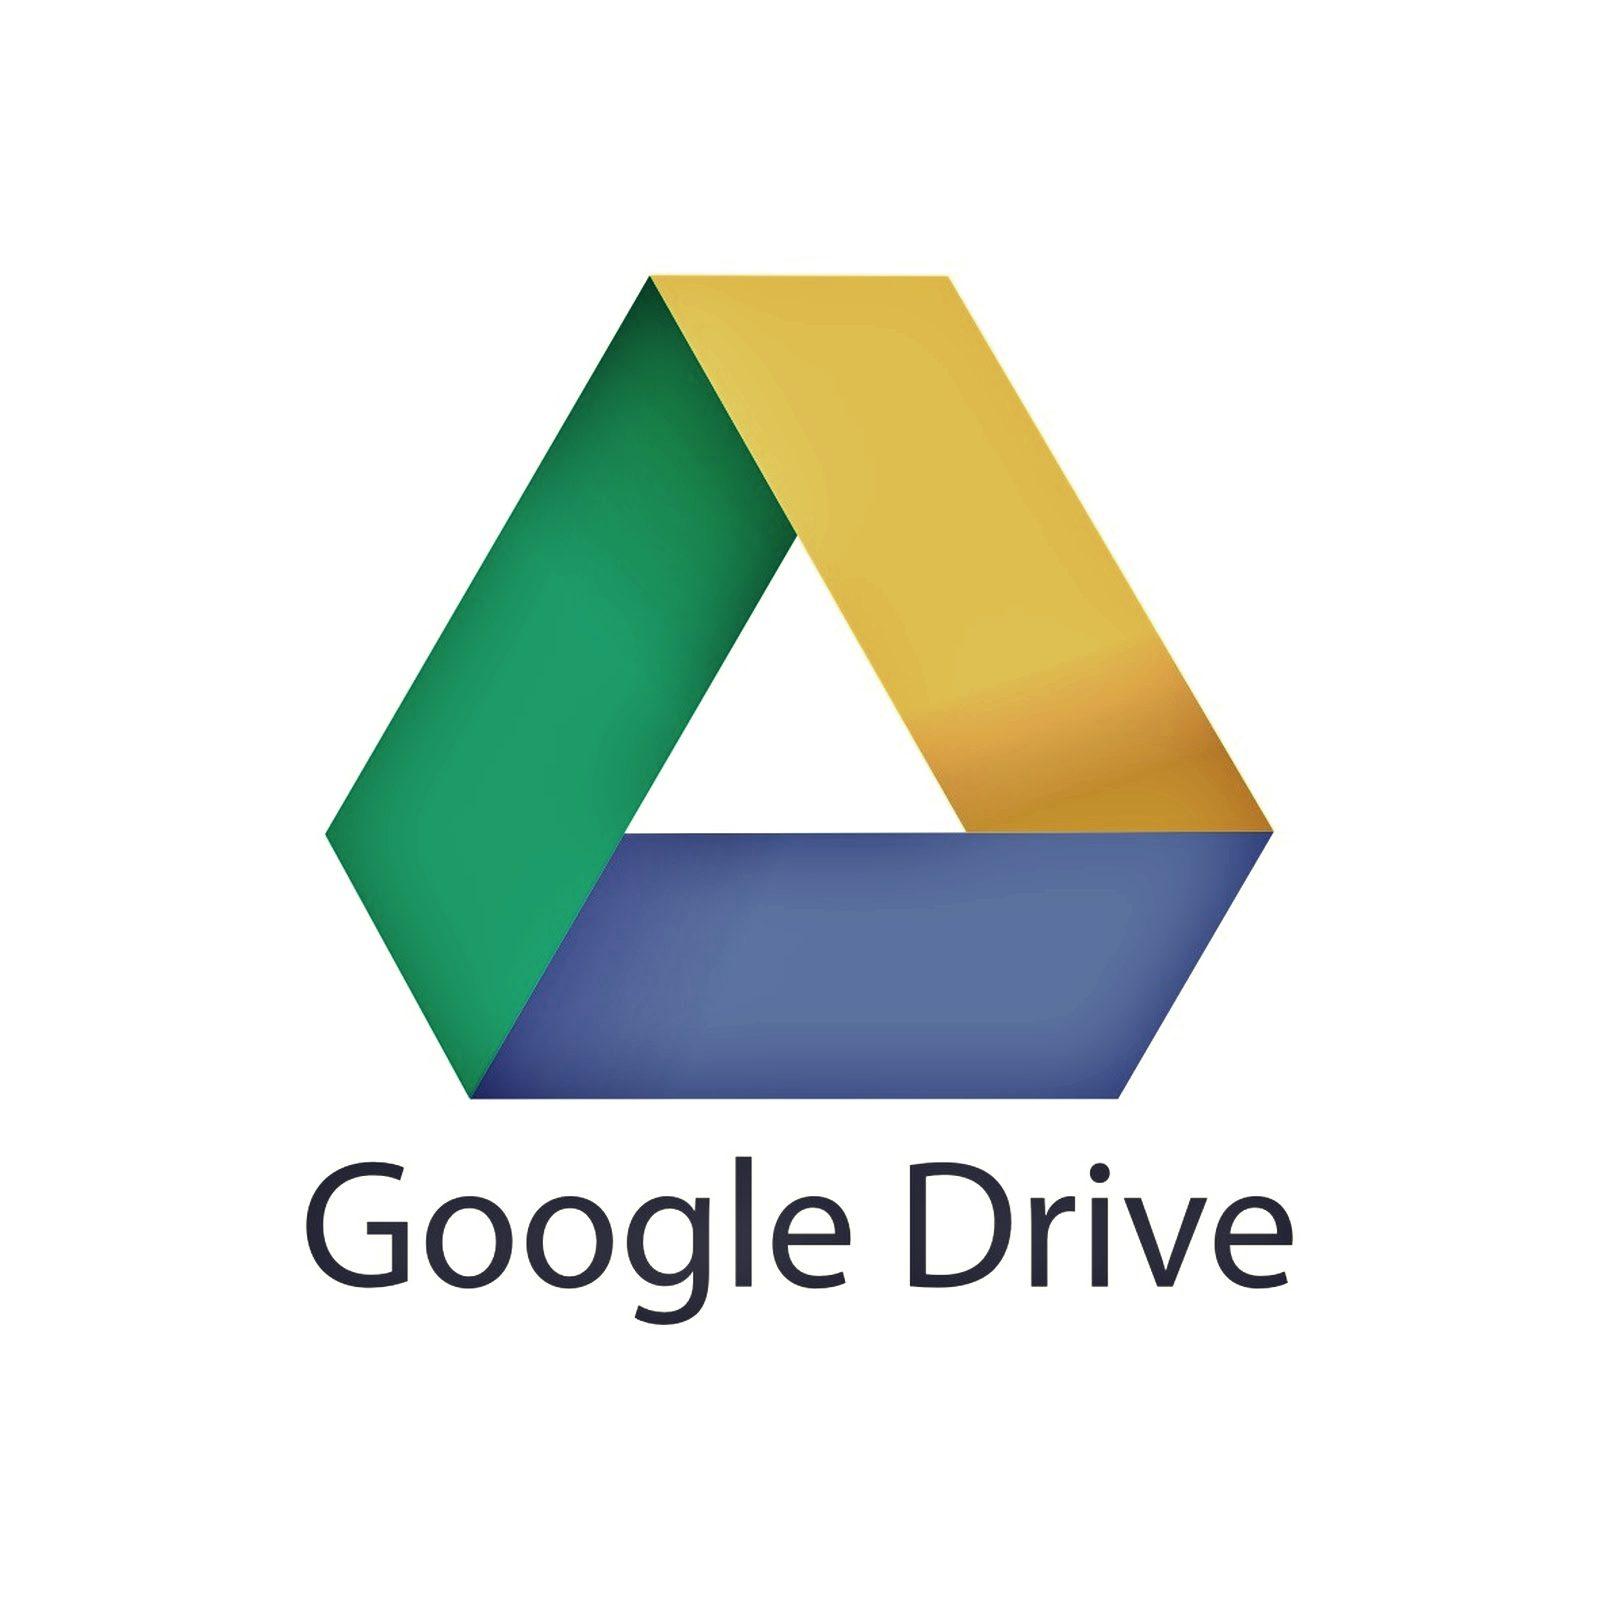 Google Drivepic